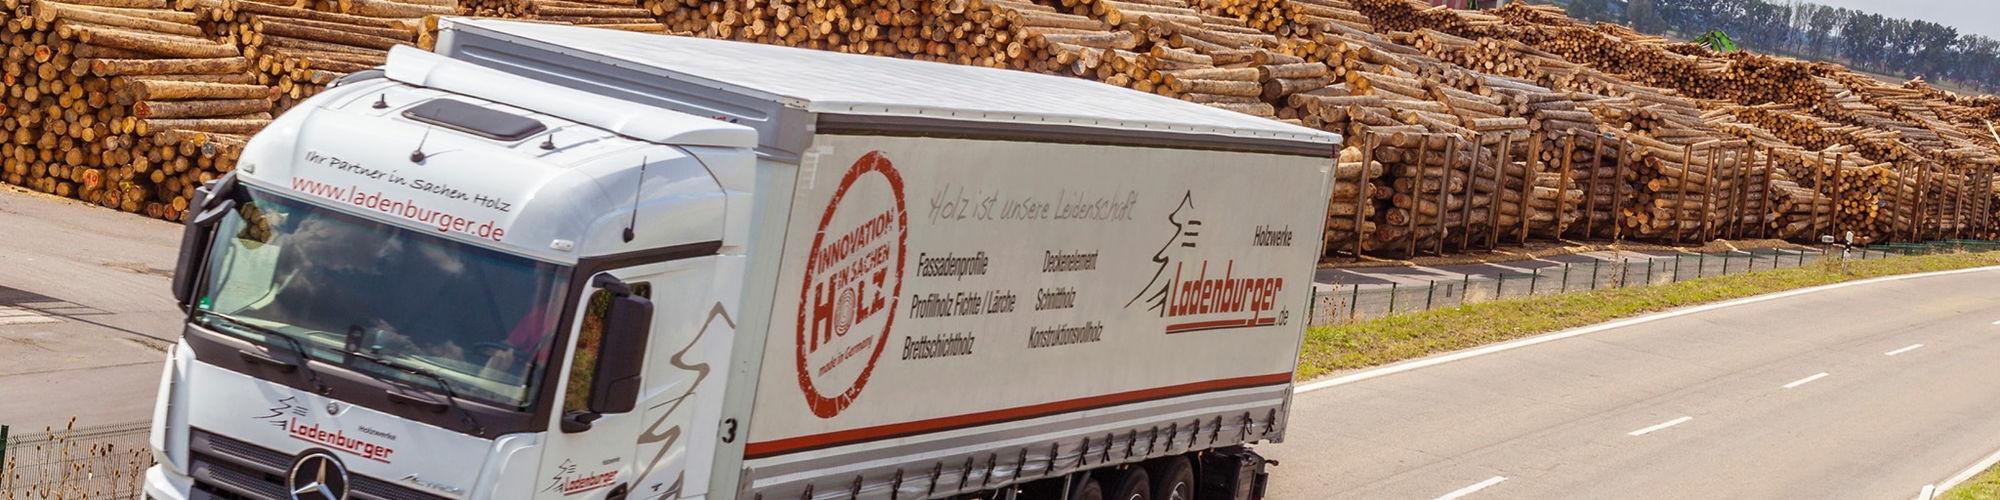 Holzwerke Ladenburger